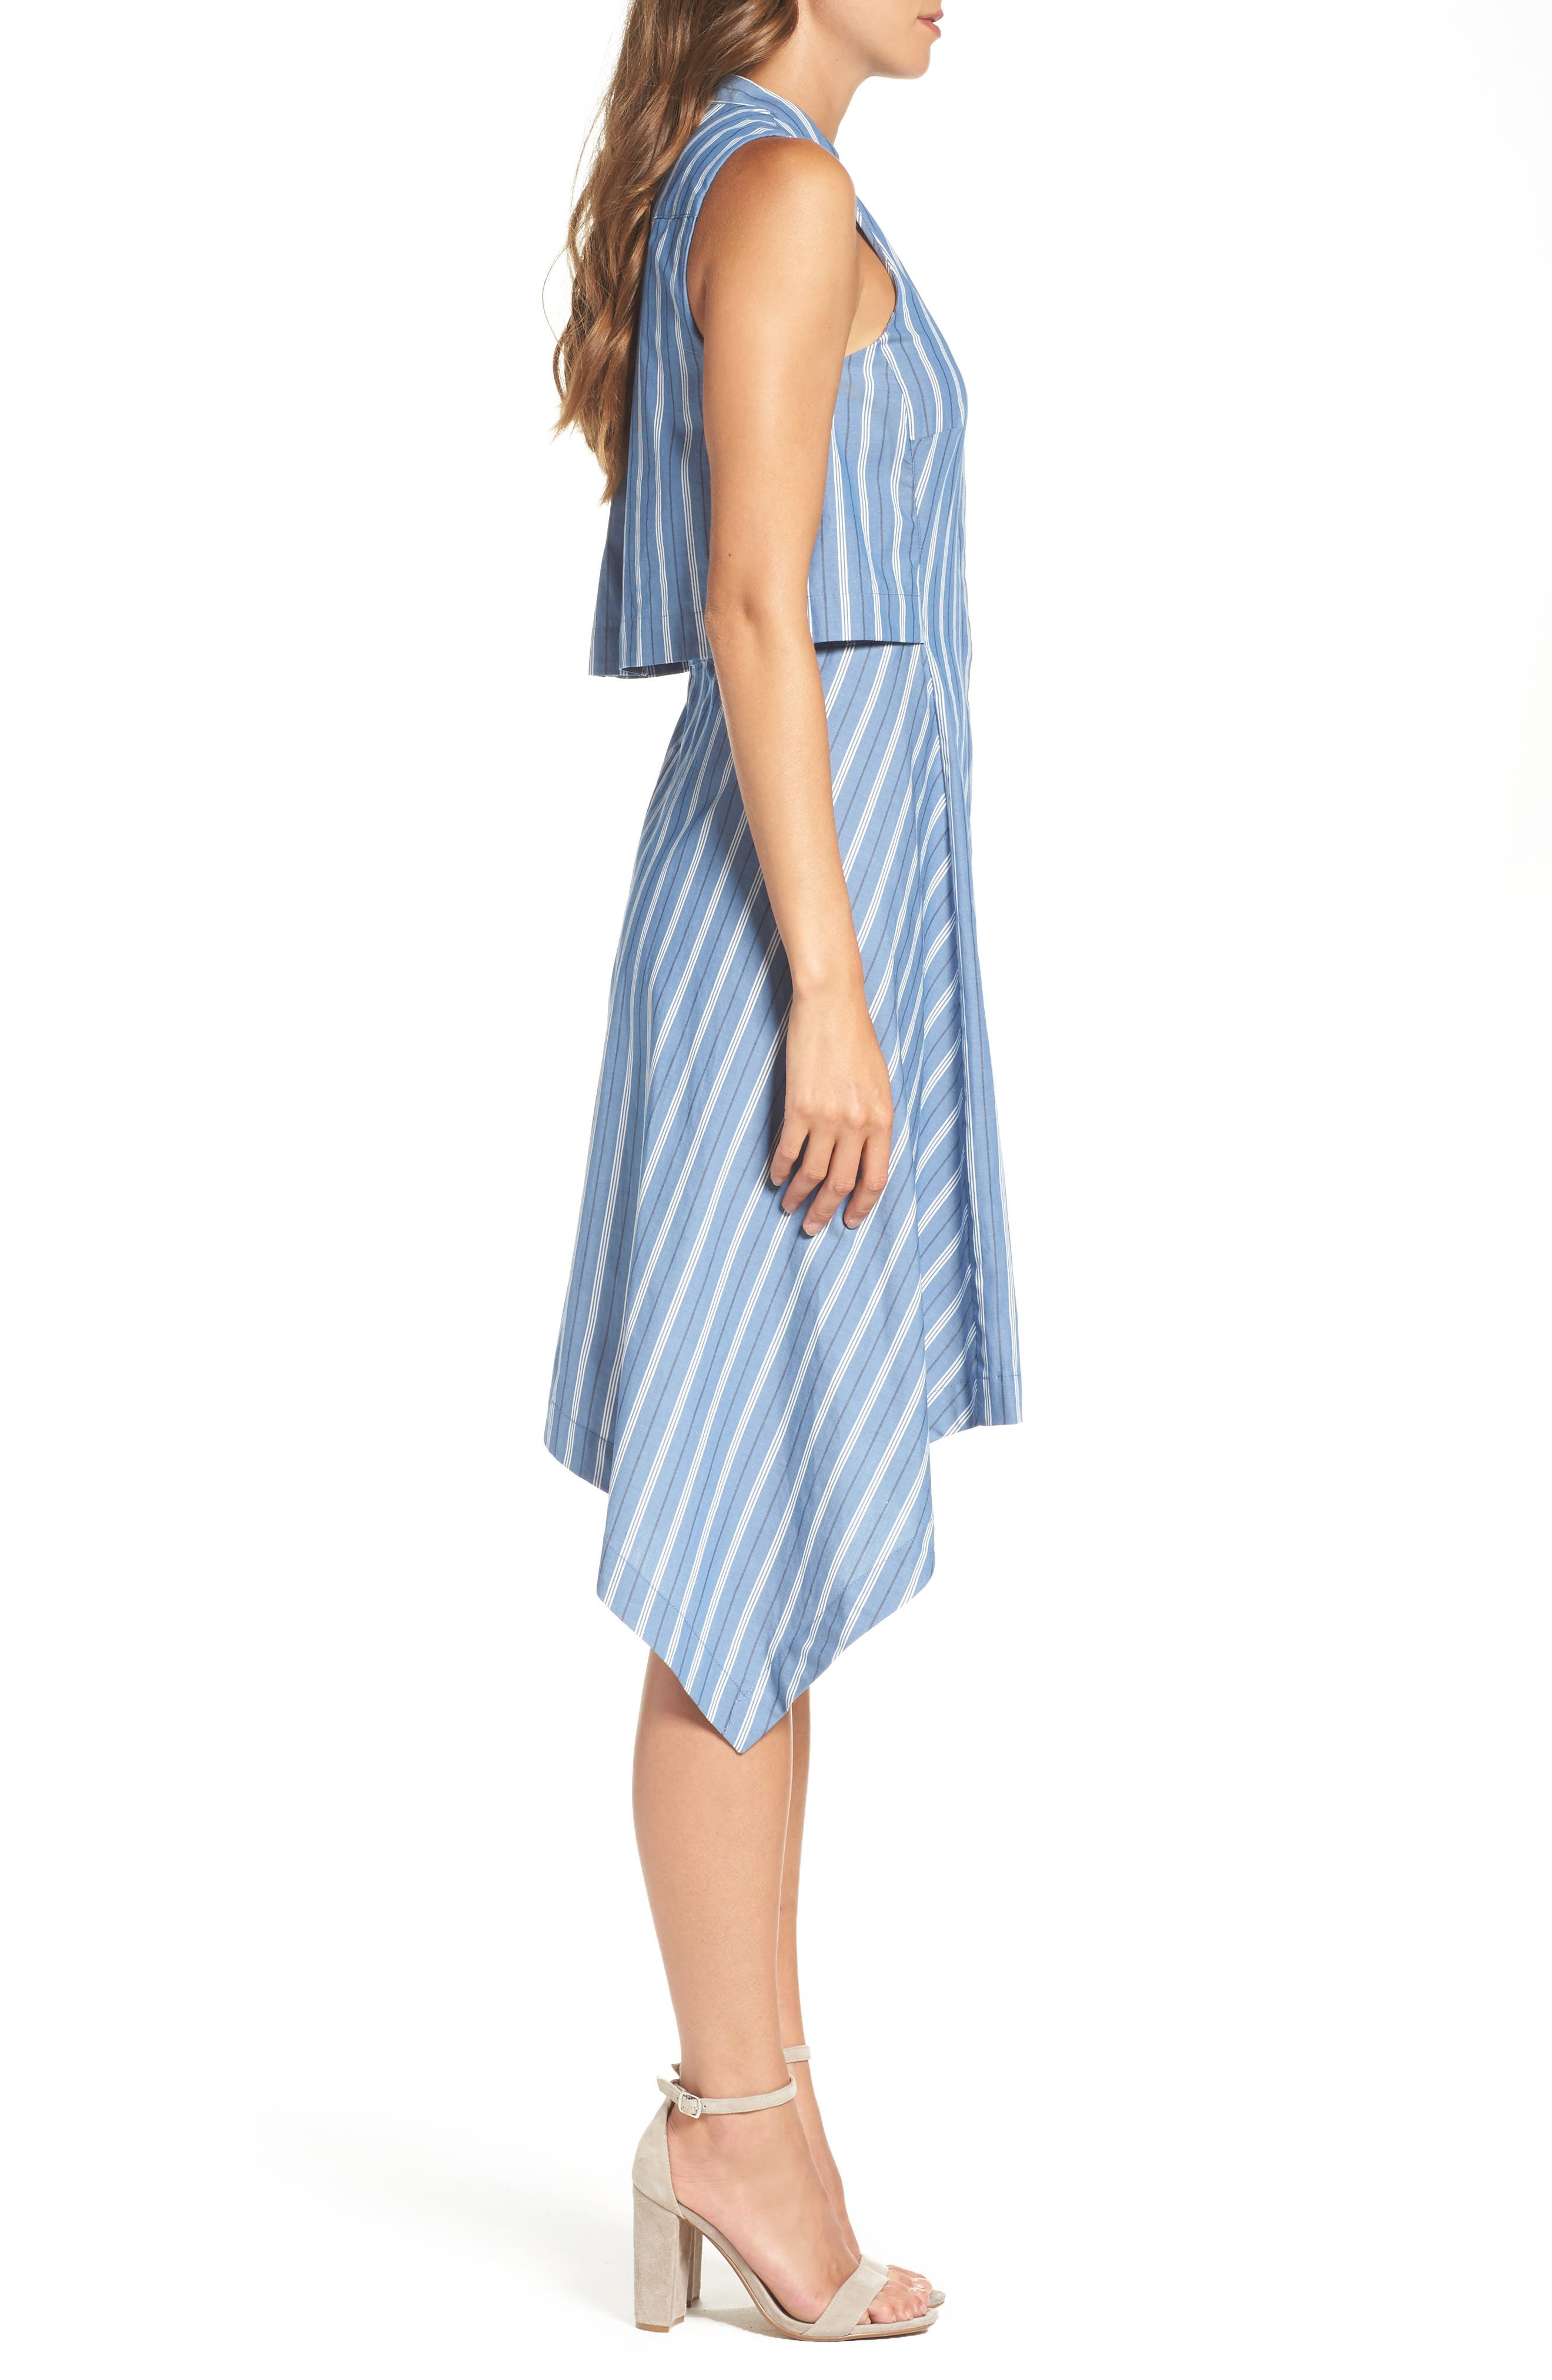 City Sleeveless Dress,                             Alternate thumbnail 3, color,                             404